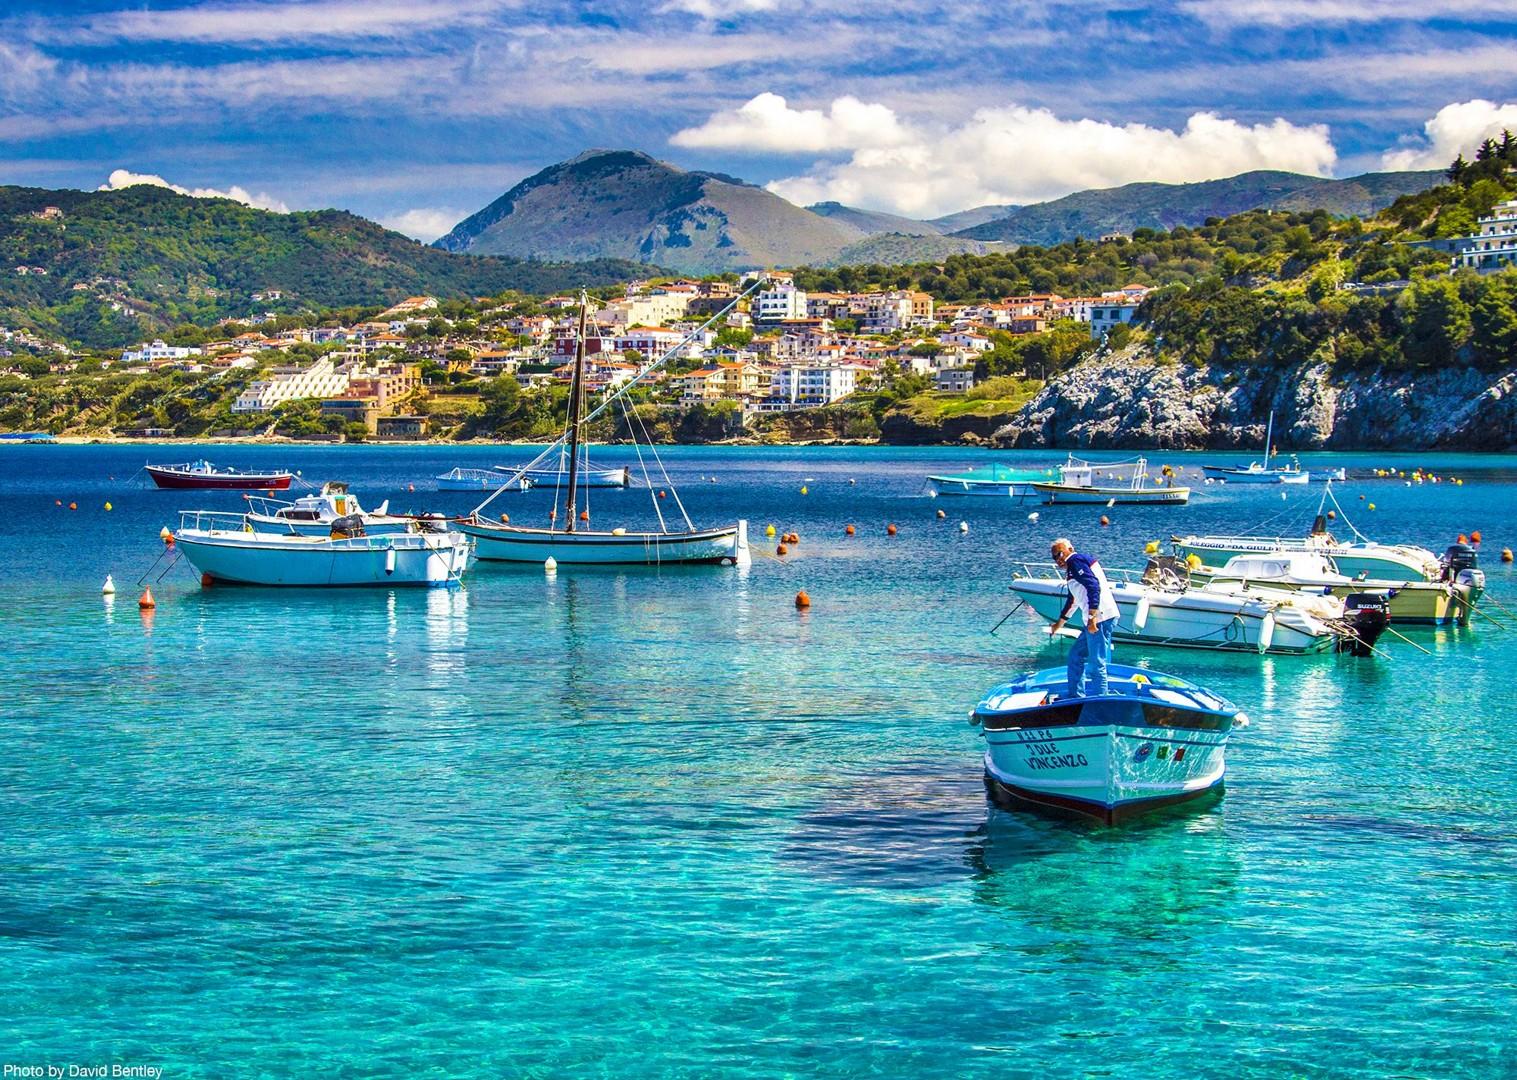 2017 Amalfi Coast_0173-2.jpg - Italy - Cilento and The Amalfi Coast - Self-Guided Leisure Cycling Holiday - Italia Leisure and Family Cycling